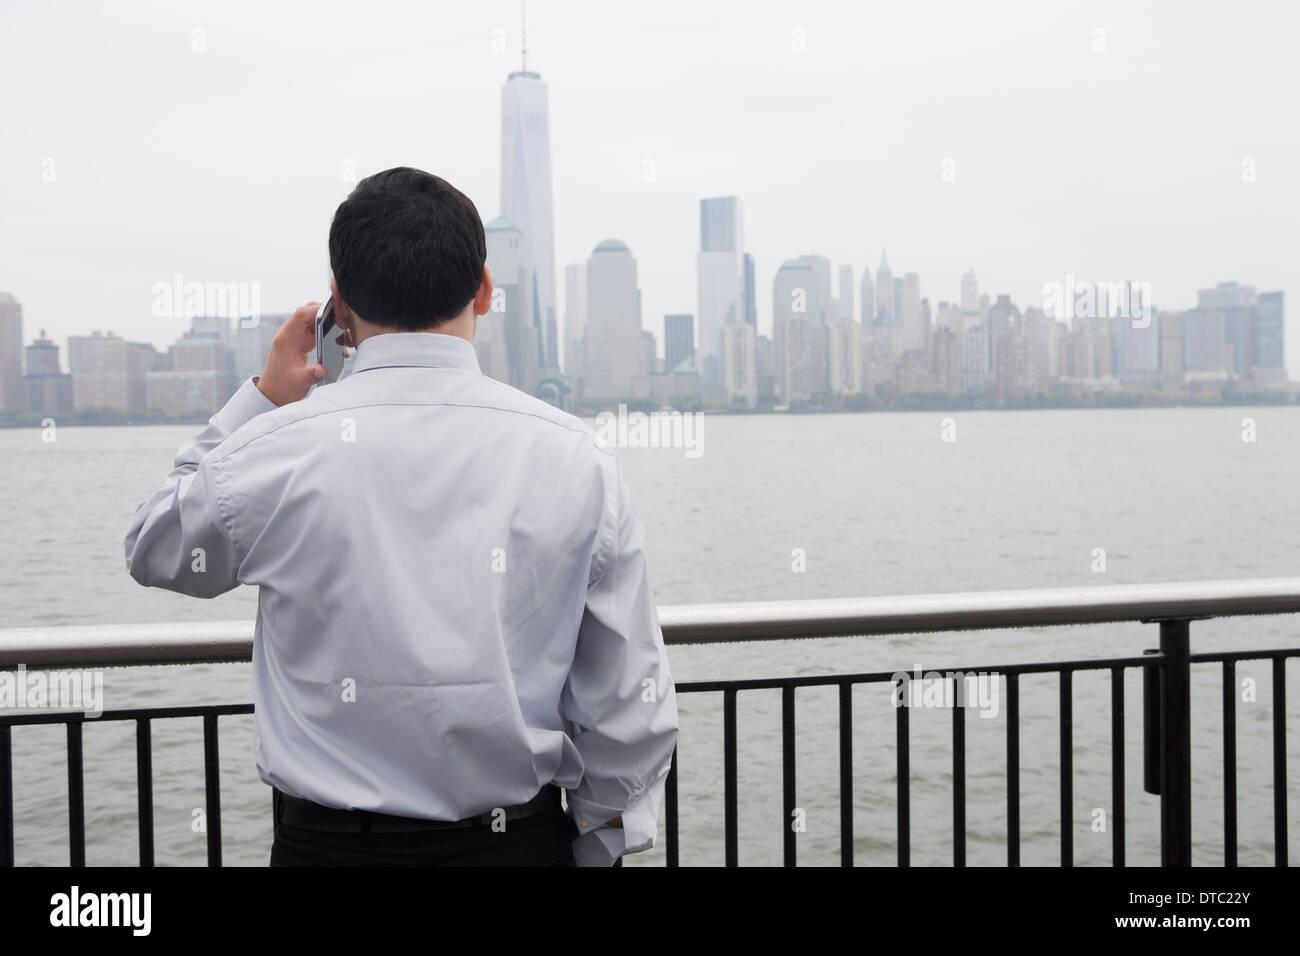 Businessman using cellular phone, Hoboken, New Jersey, USA - Stock Image